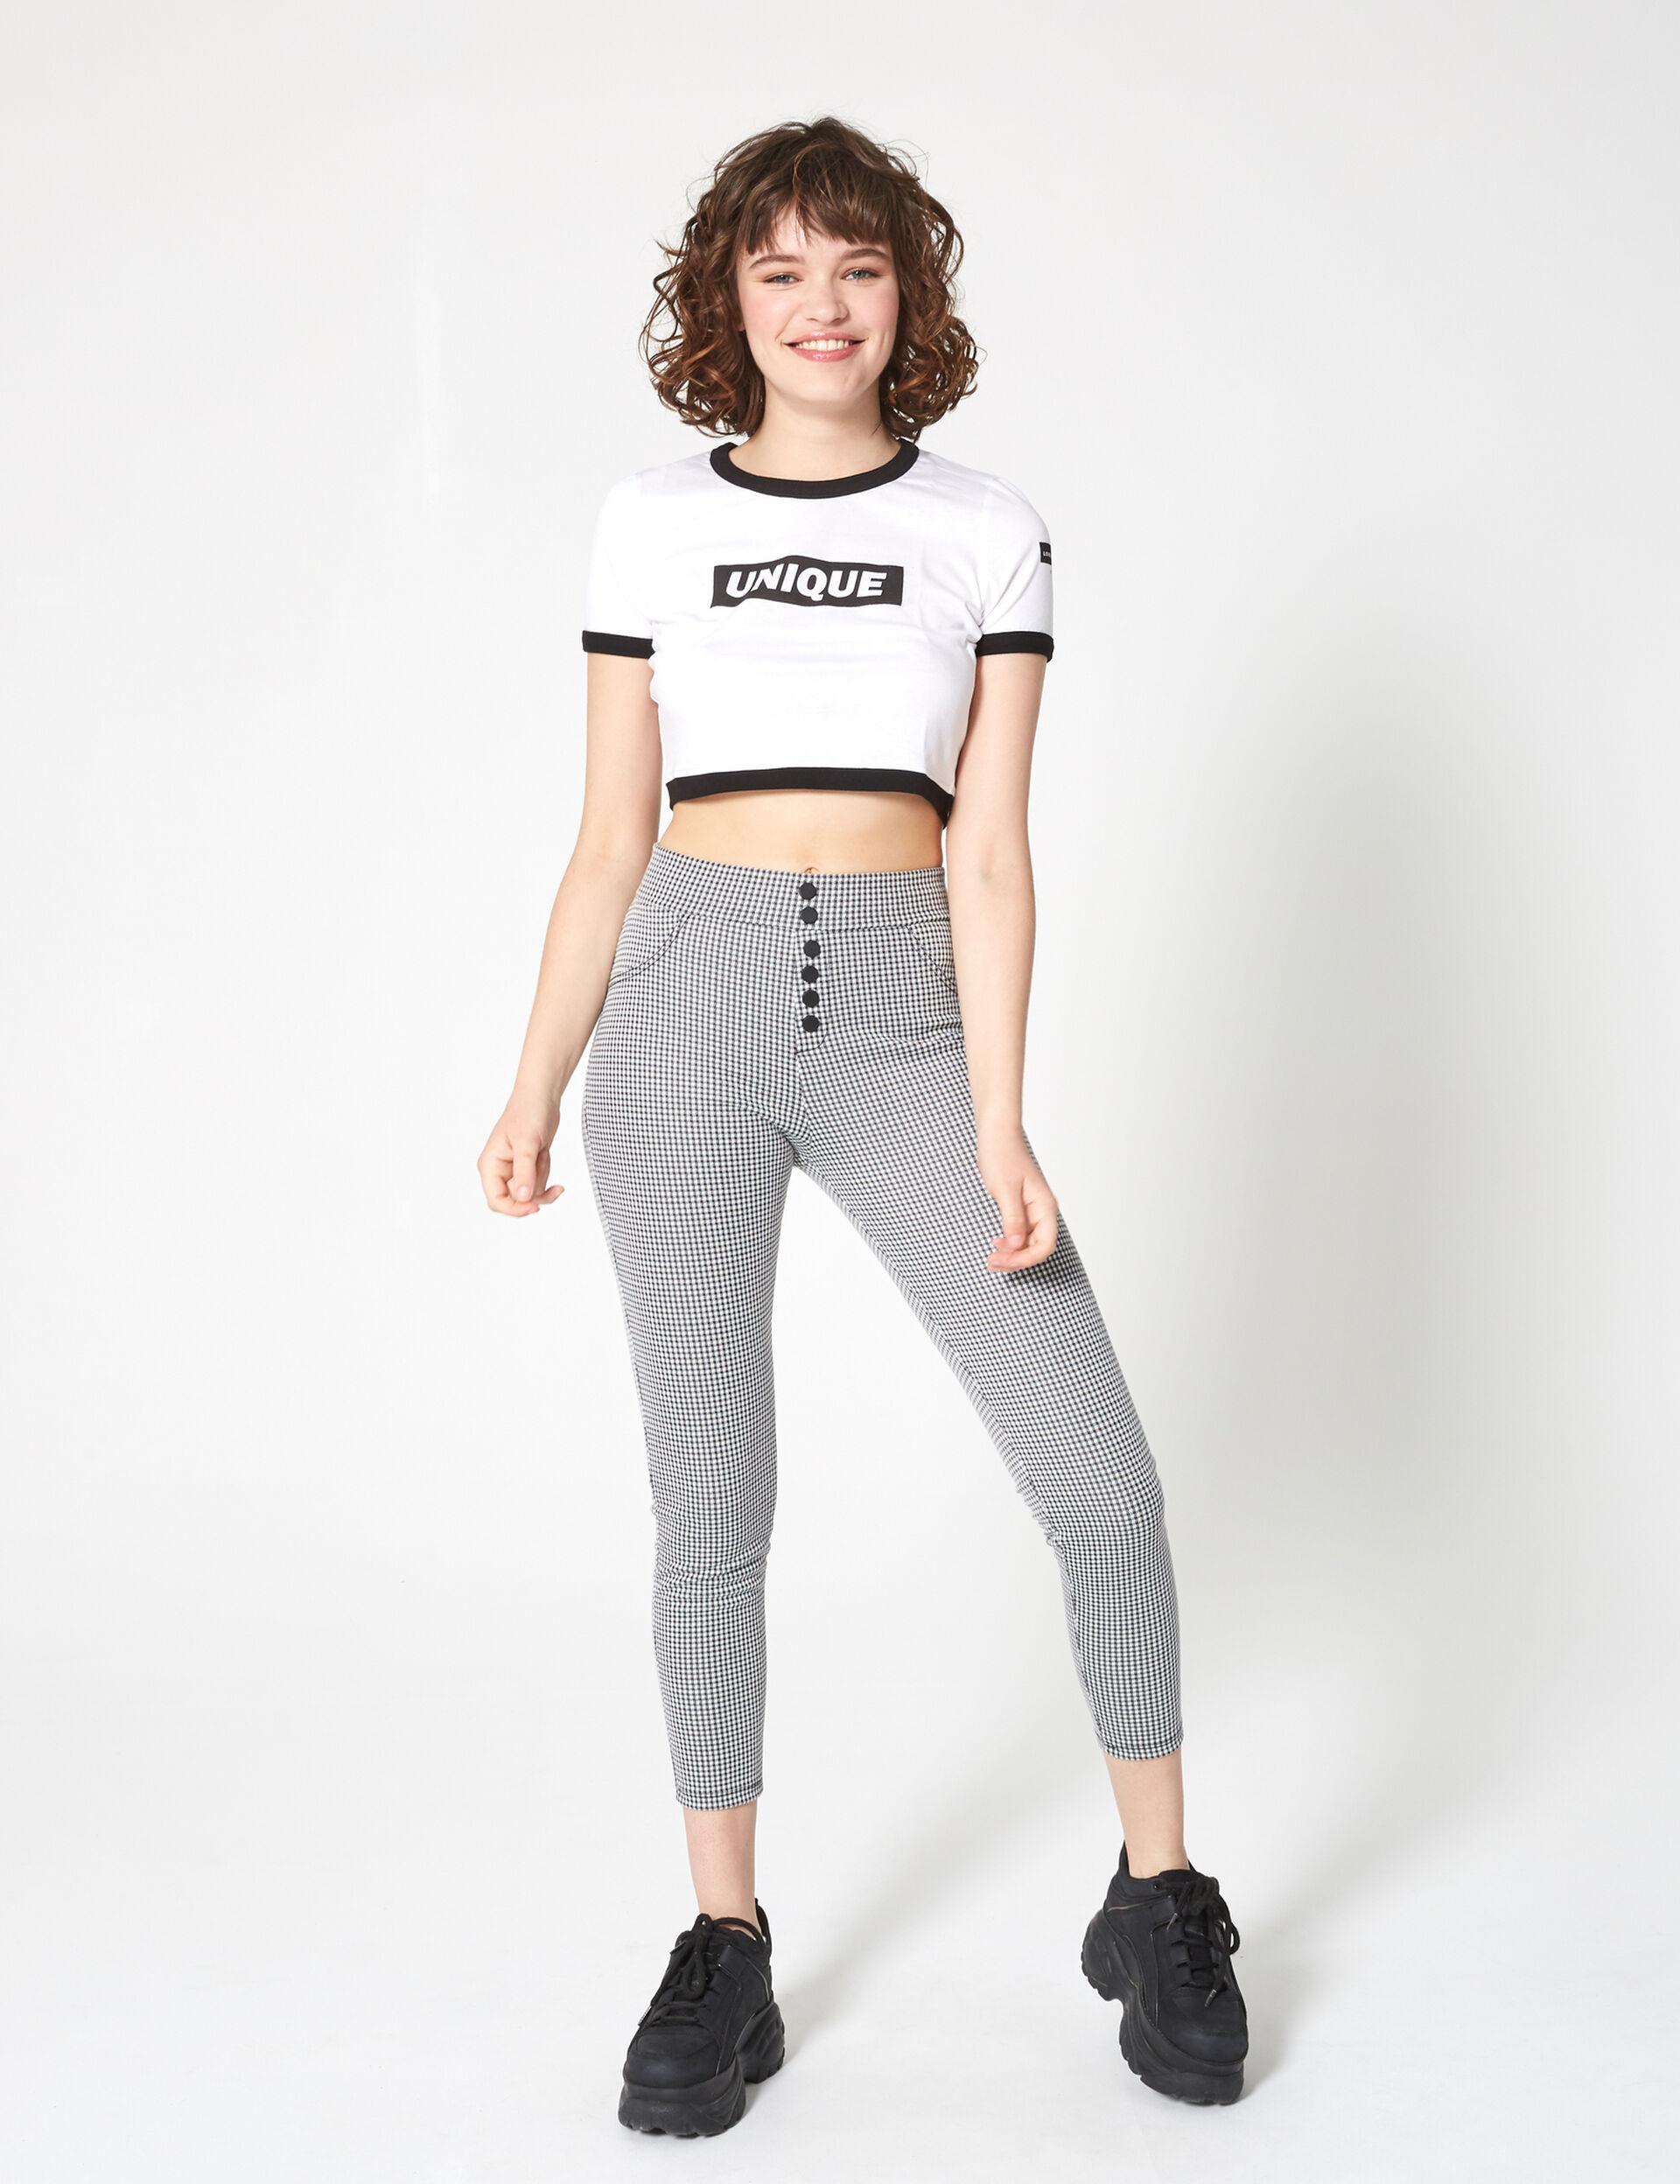 Plain t-shirt with slogan